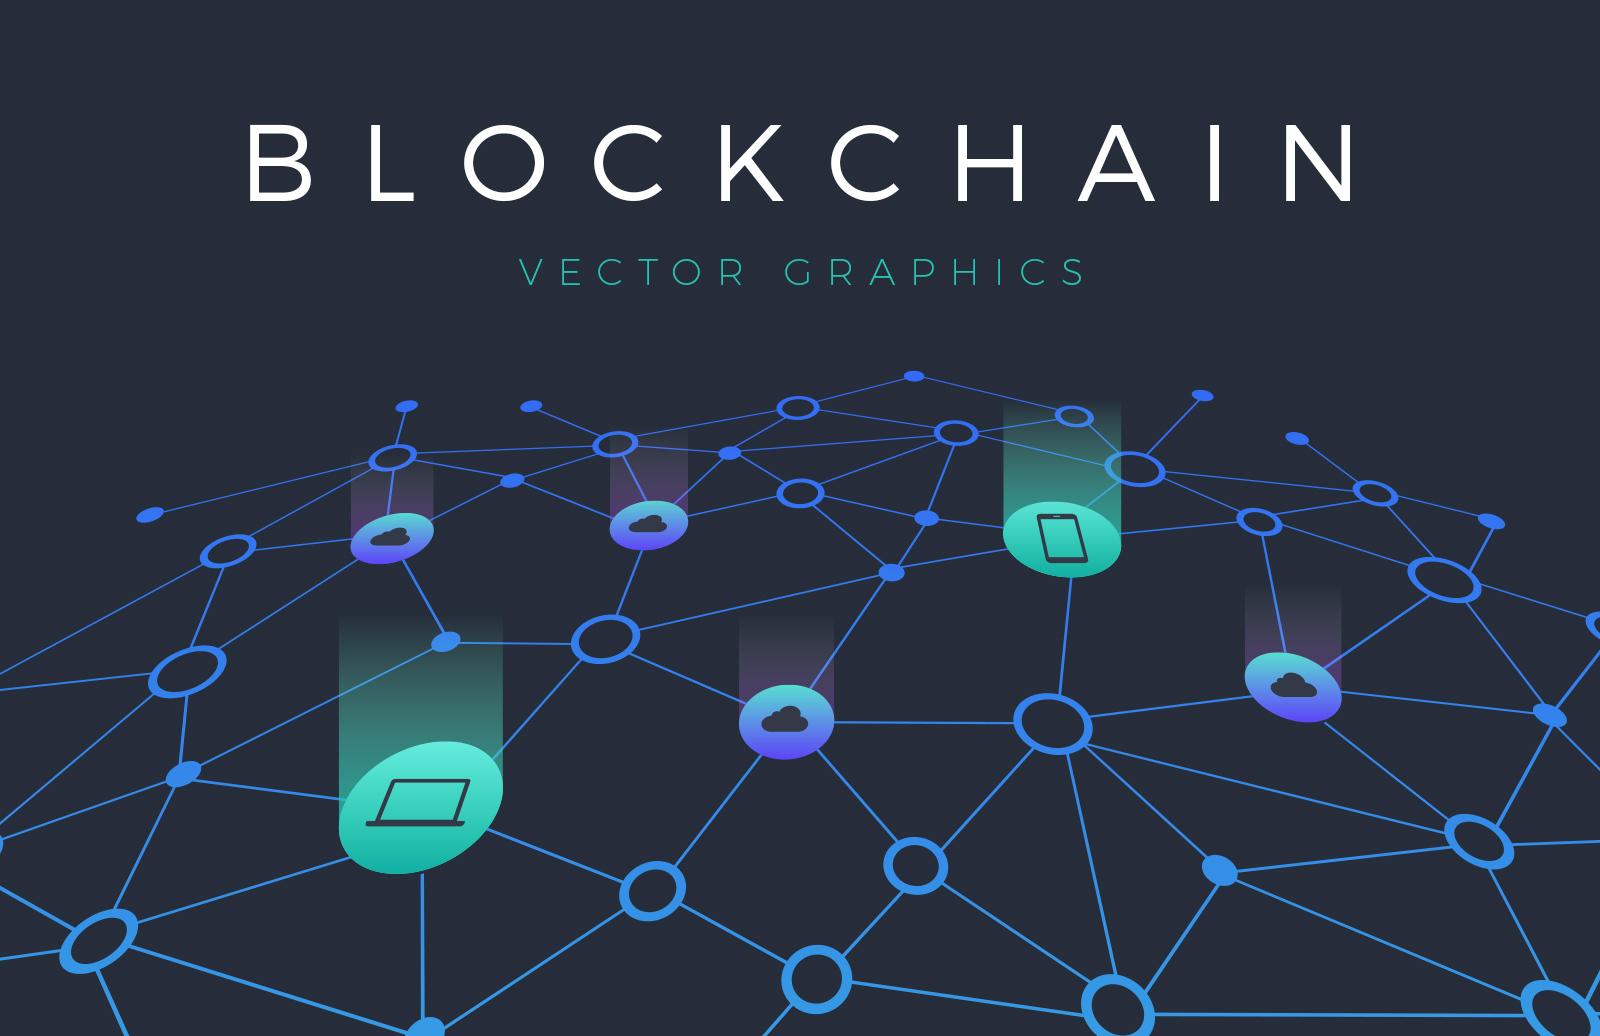 Blockchain Vectors Preview 1A